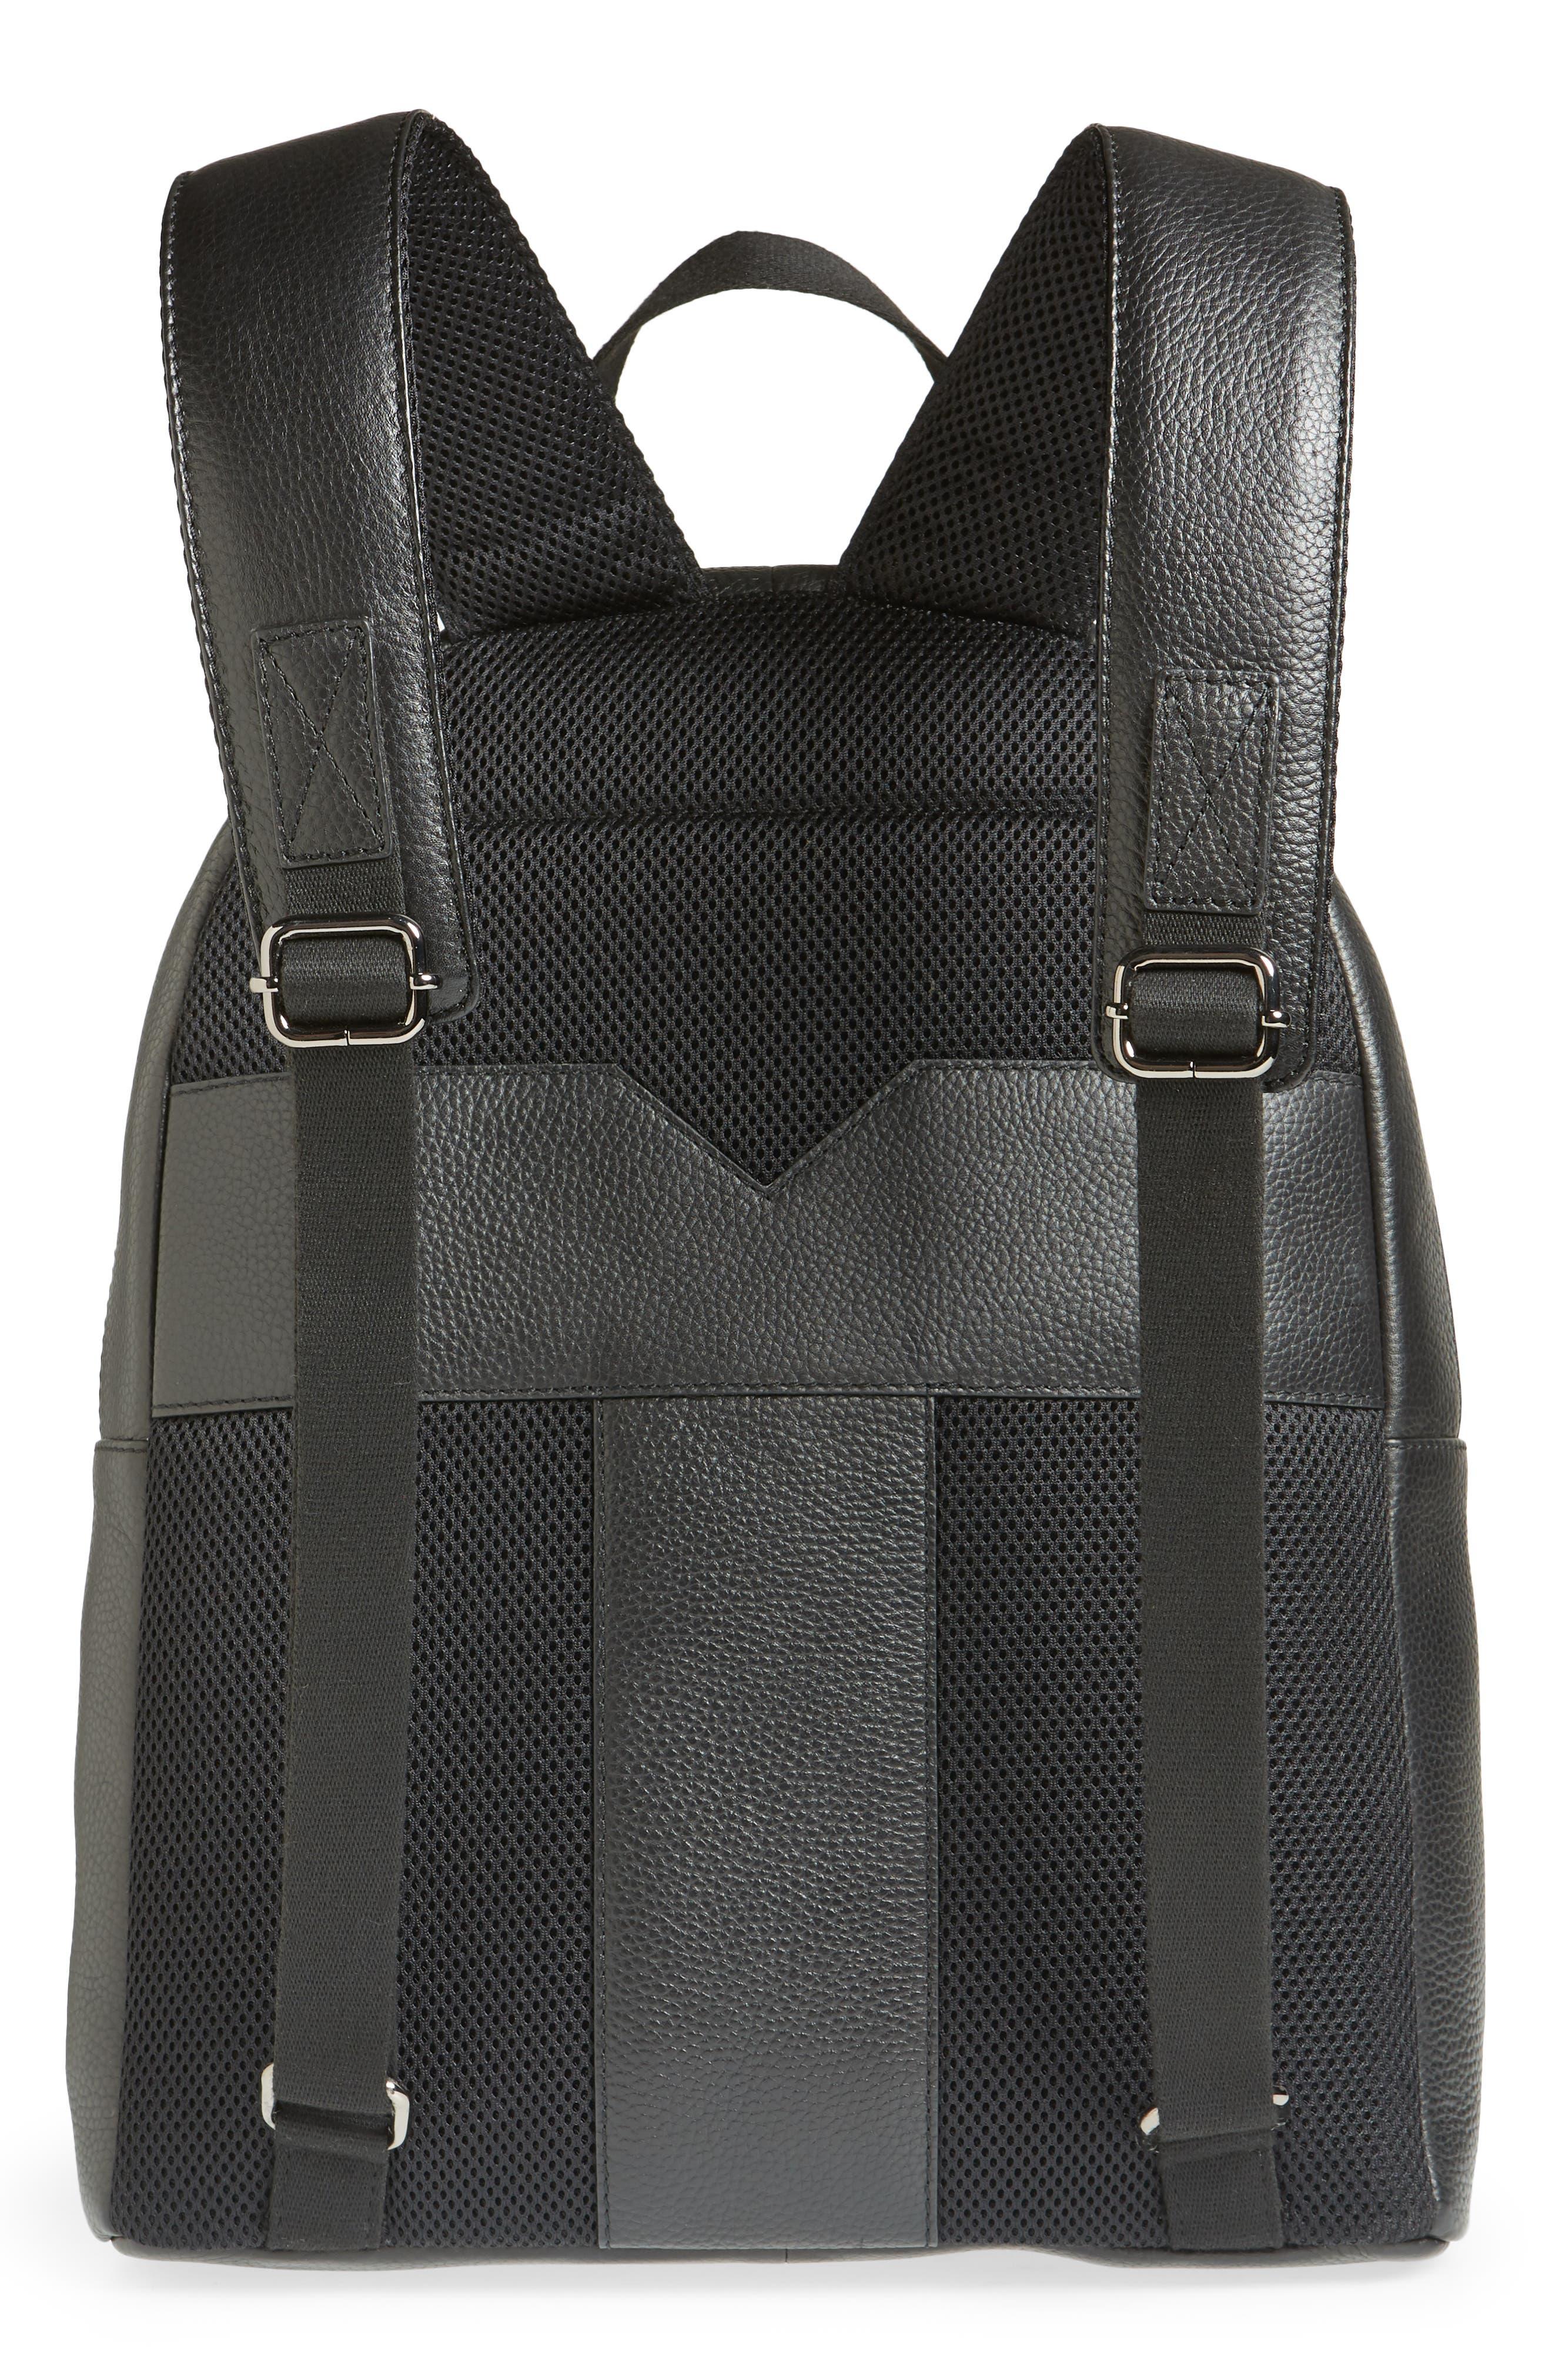 Rickrak Leather Backpack,                             Alternate thumbnail 3, color,                             BLACK